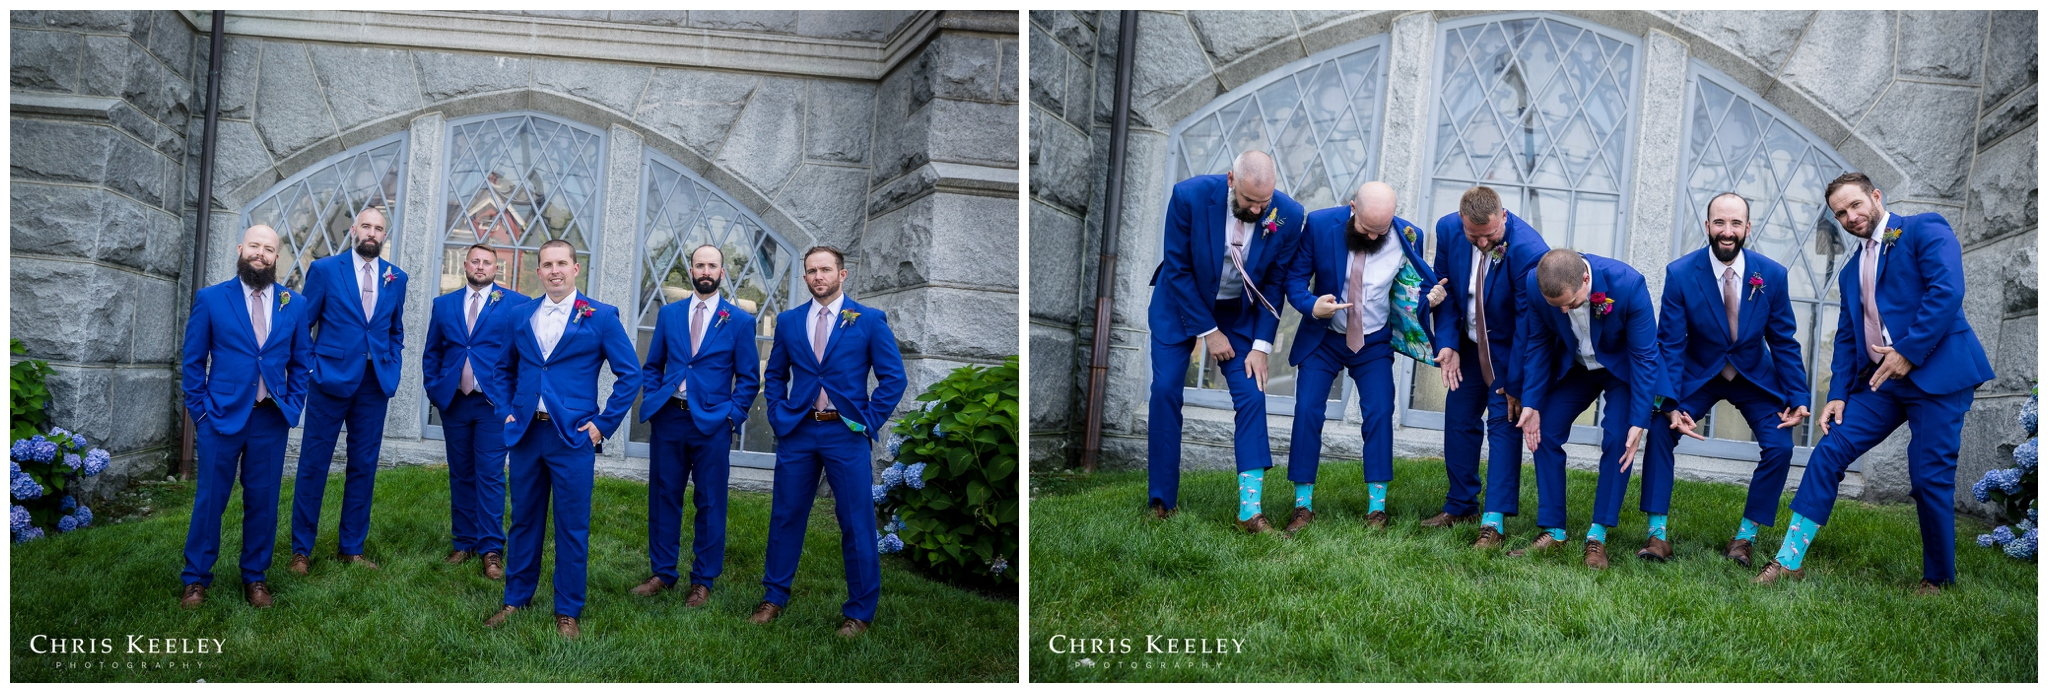 groomsmen-with-fun-socks.jpg